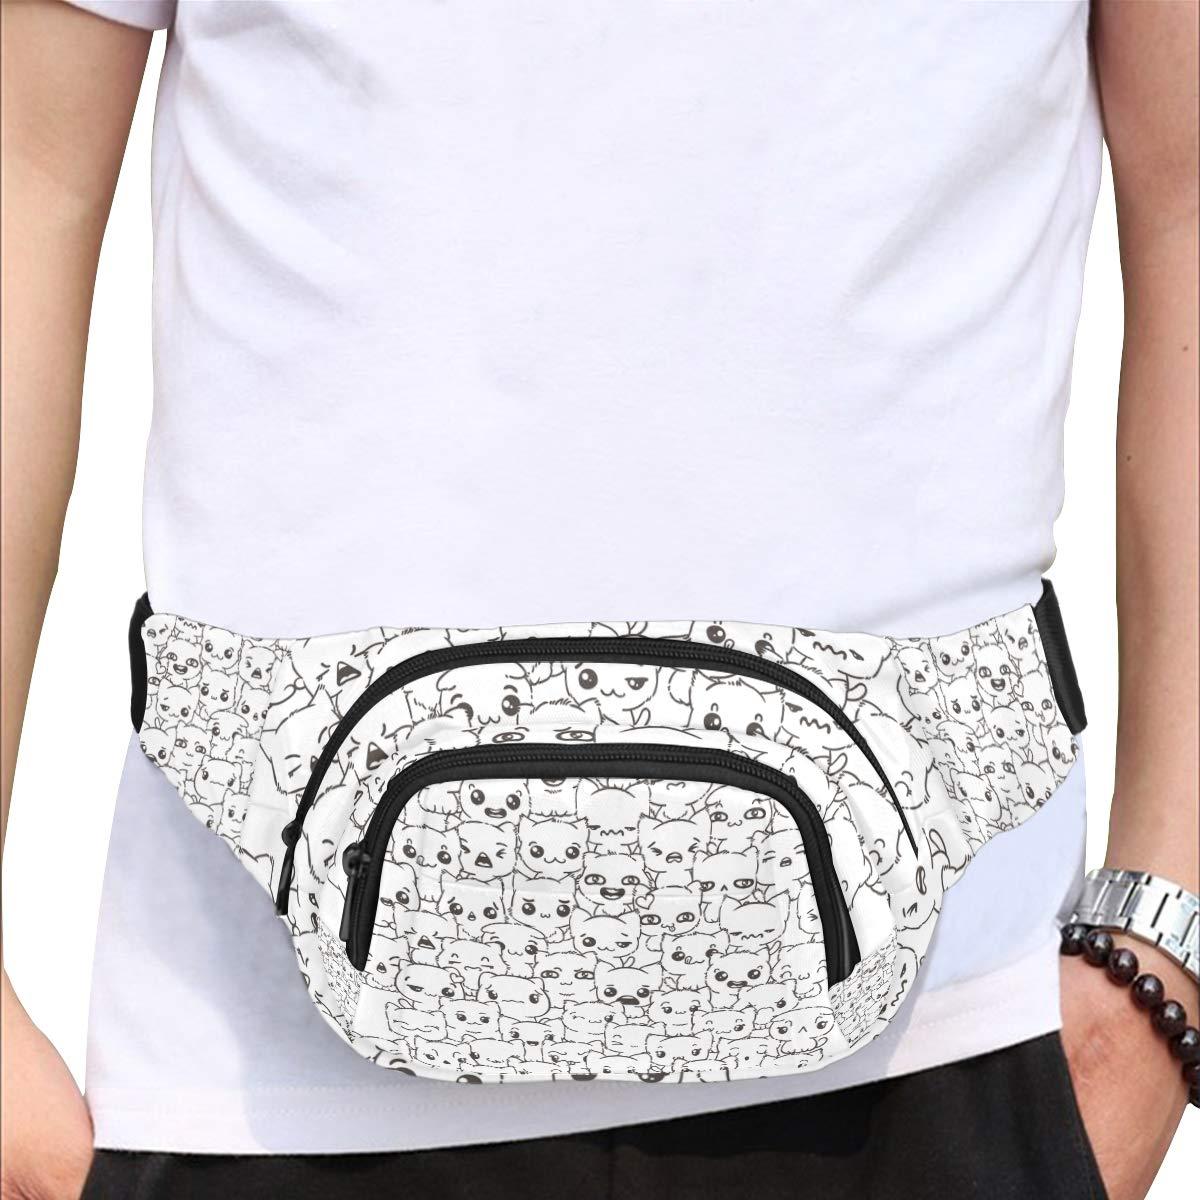 Cute Animal Doodle Art Balck And White Fenny Packs Waist Bags Adjustable Belt Waterproof Nylon Travel Running Sport Vacation Party For Men Women Boys Girls Kids